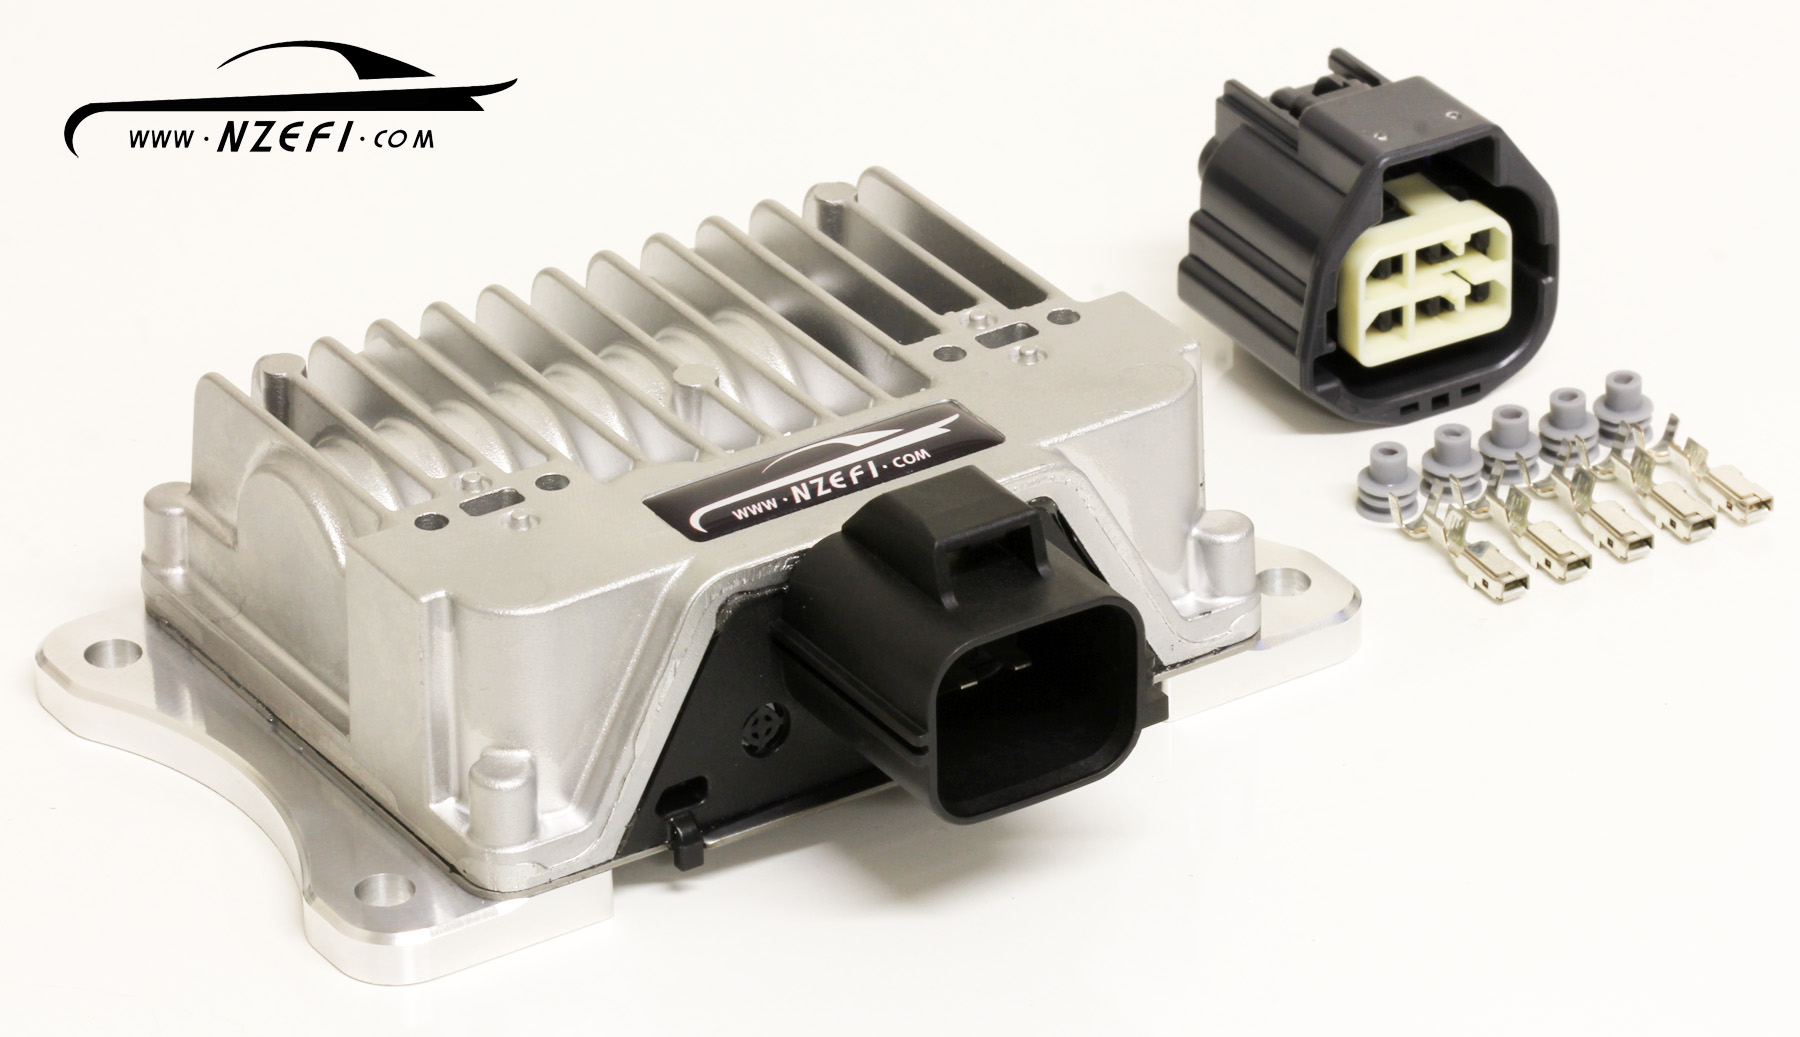 Pwm fuel pump mac tools trolley jack